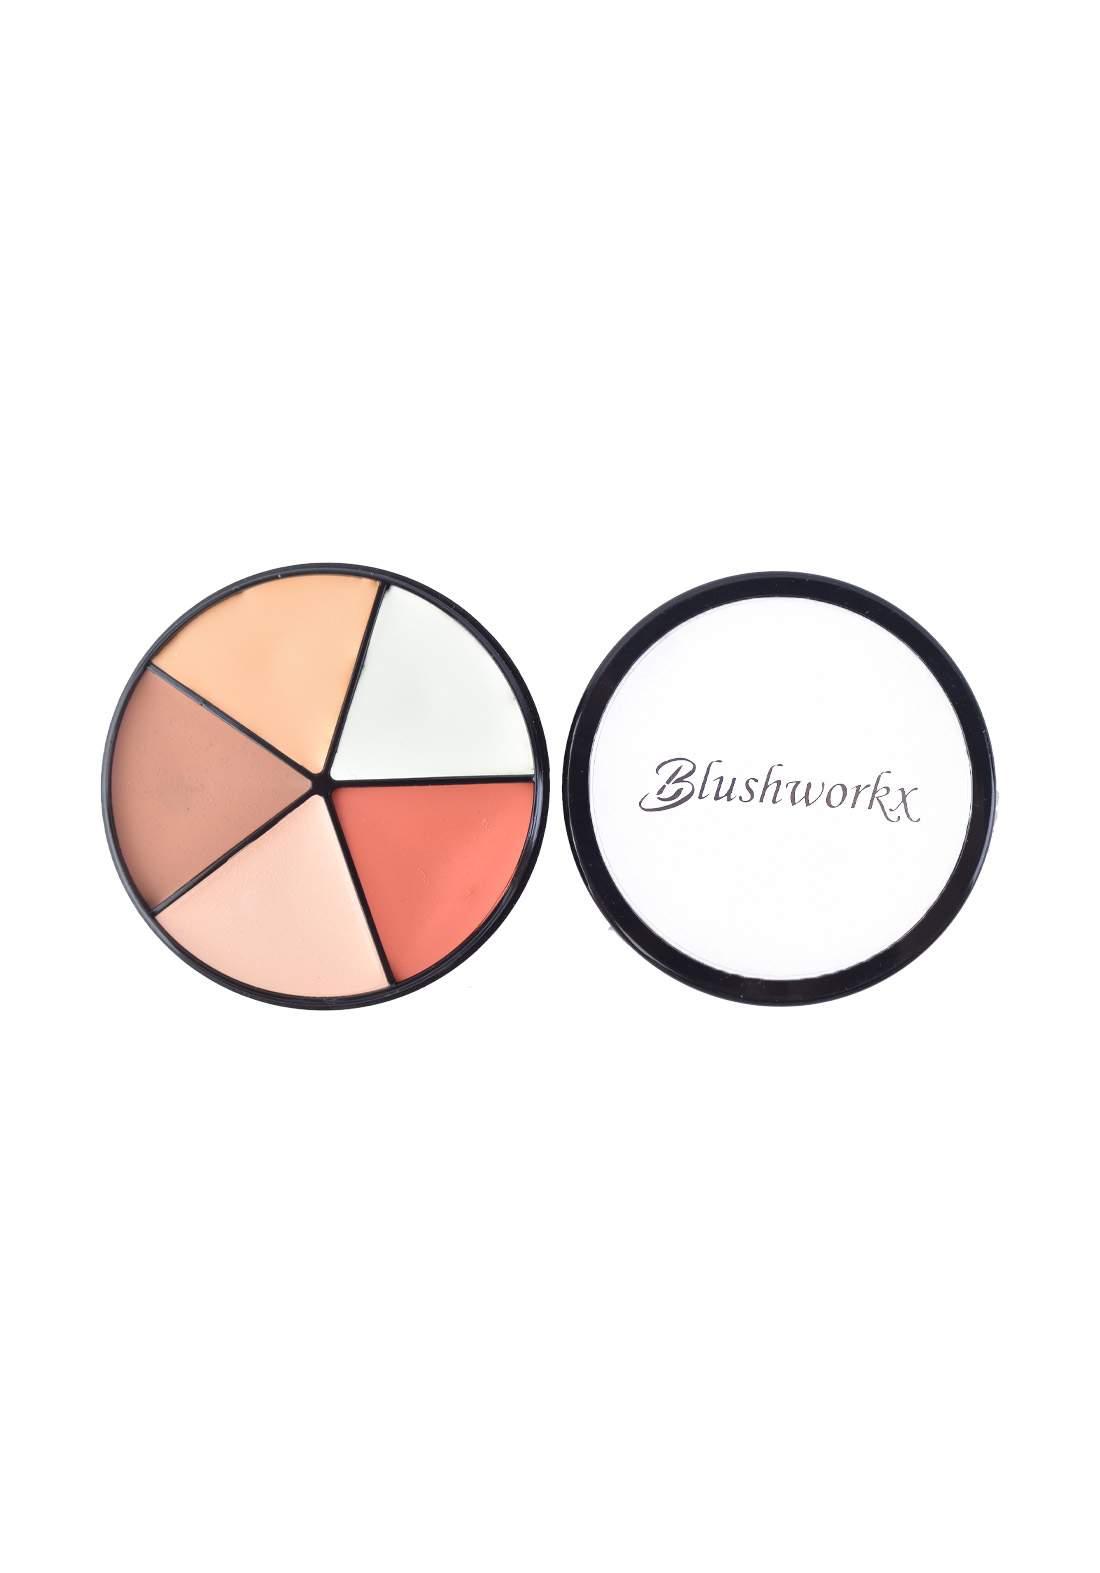 Blushworkx  All Around Contour Cover 28.34g خافي عيوب و مصحح لون البشرة